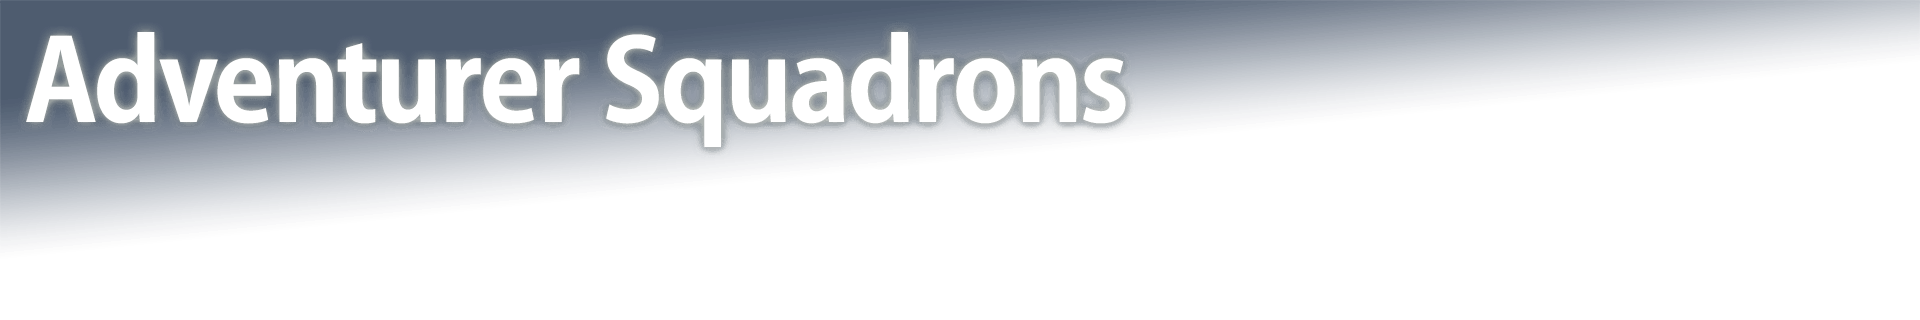 Adventurer Squadrons